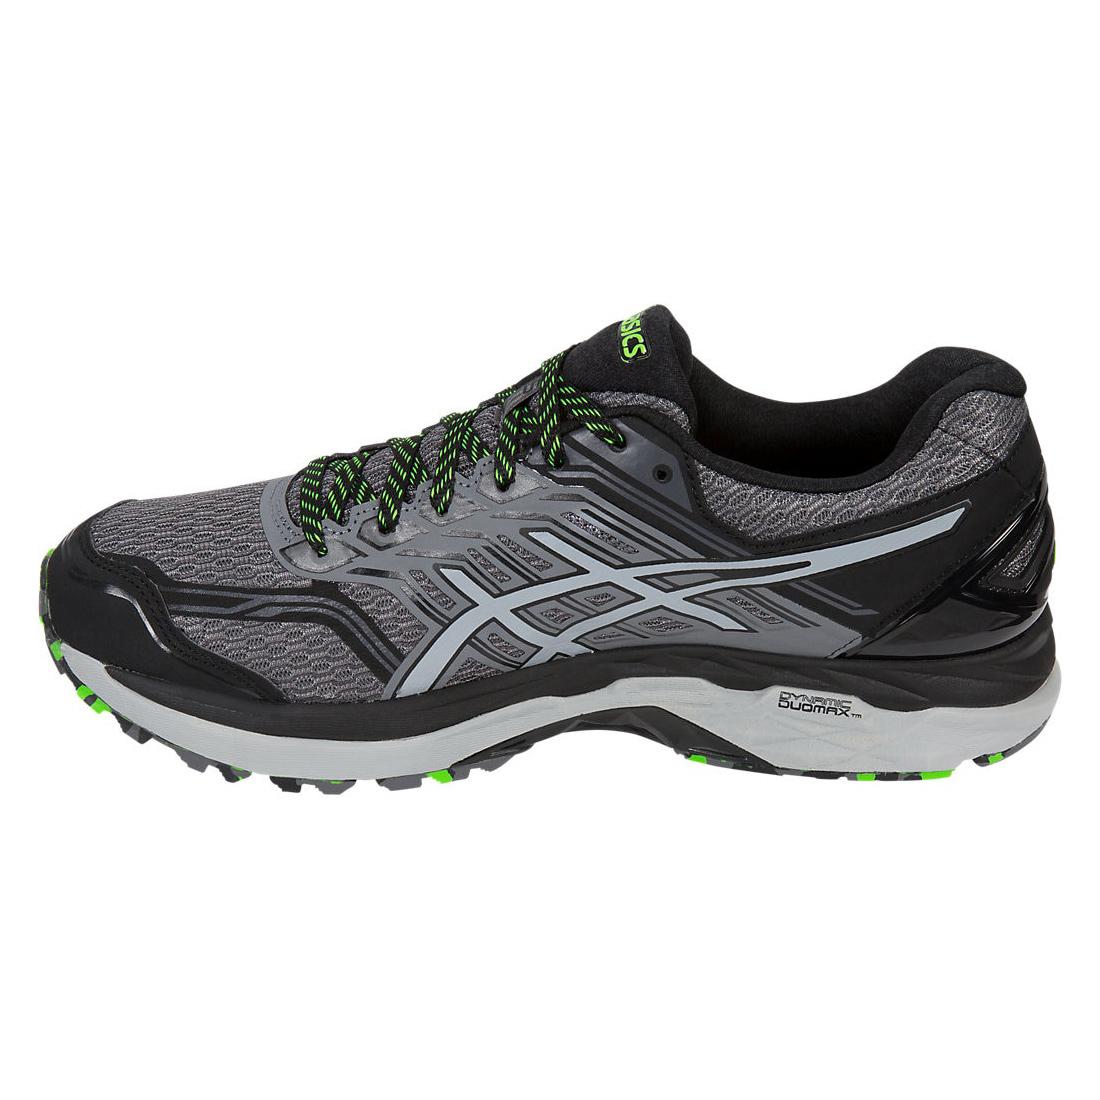 Asics GT 2000 5 Trail Herren Jogging Trail Running Schuhe T712N 9796 graugrün